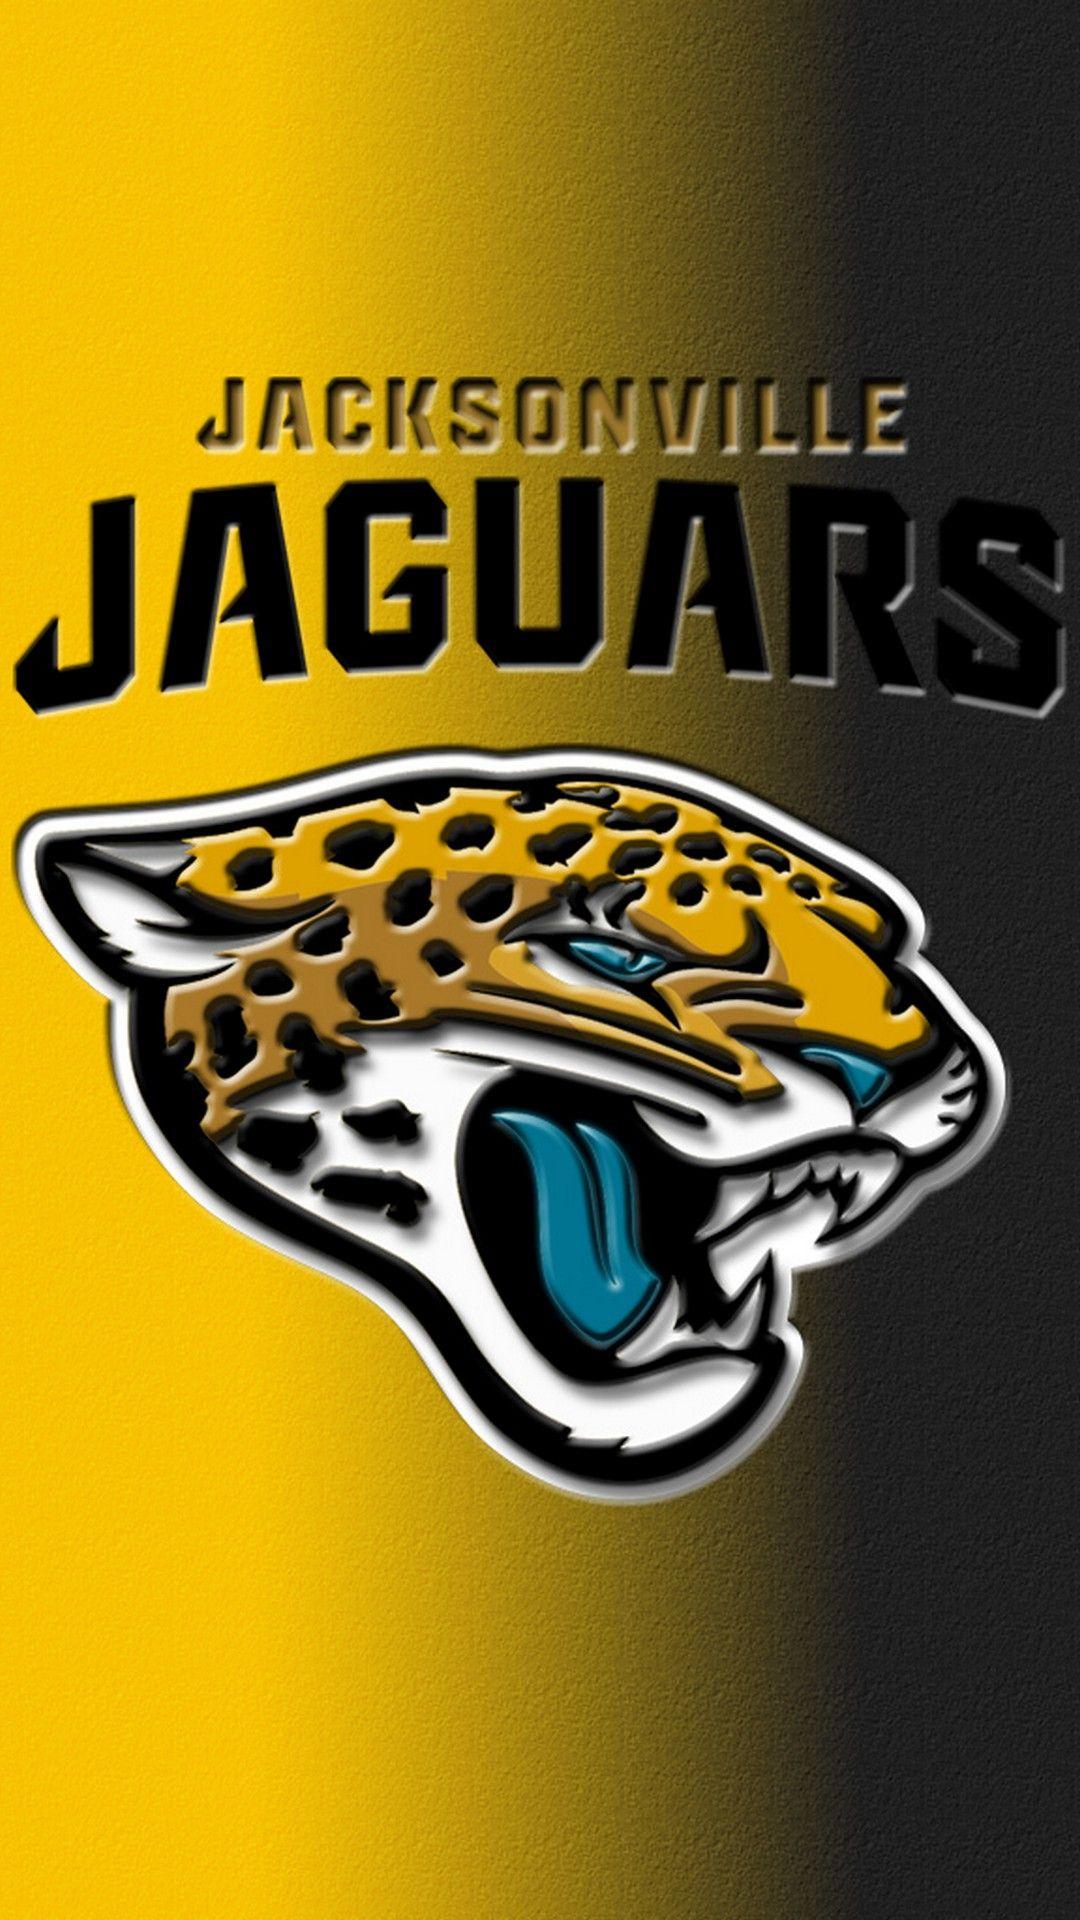 Jacksonville Jaguars HD Wallpaper For iPhone 2020 NFL